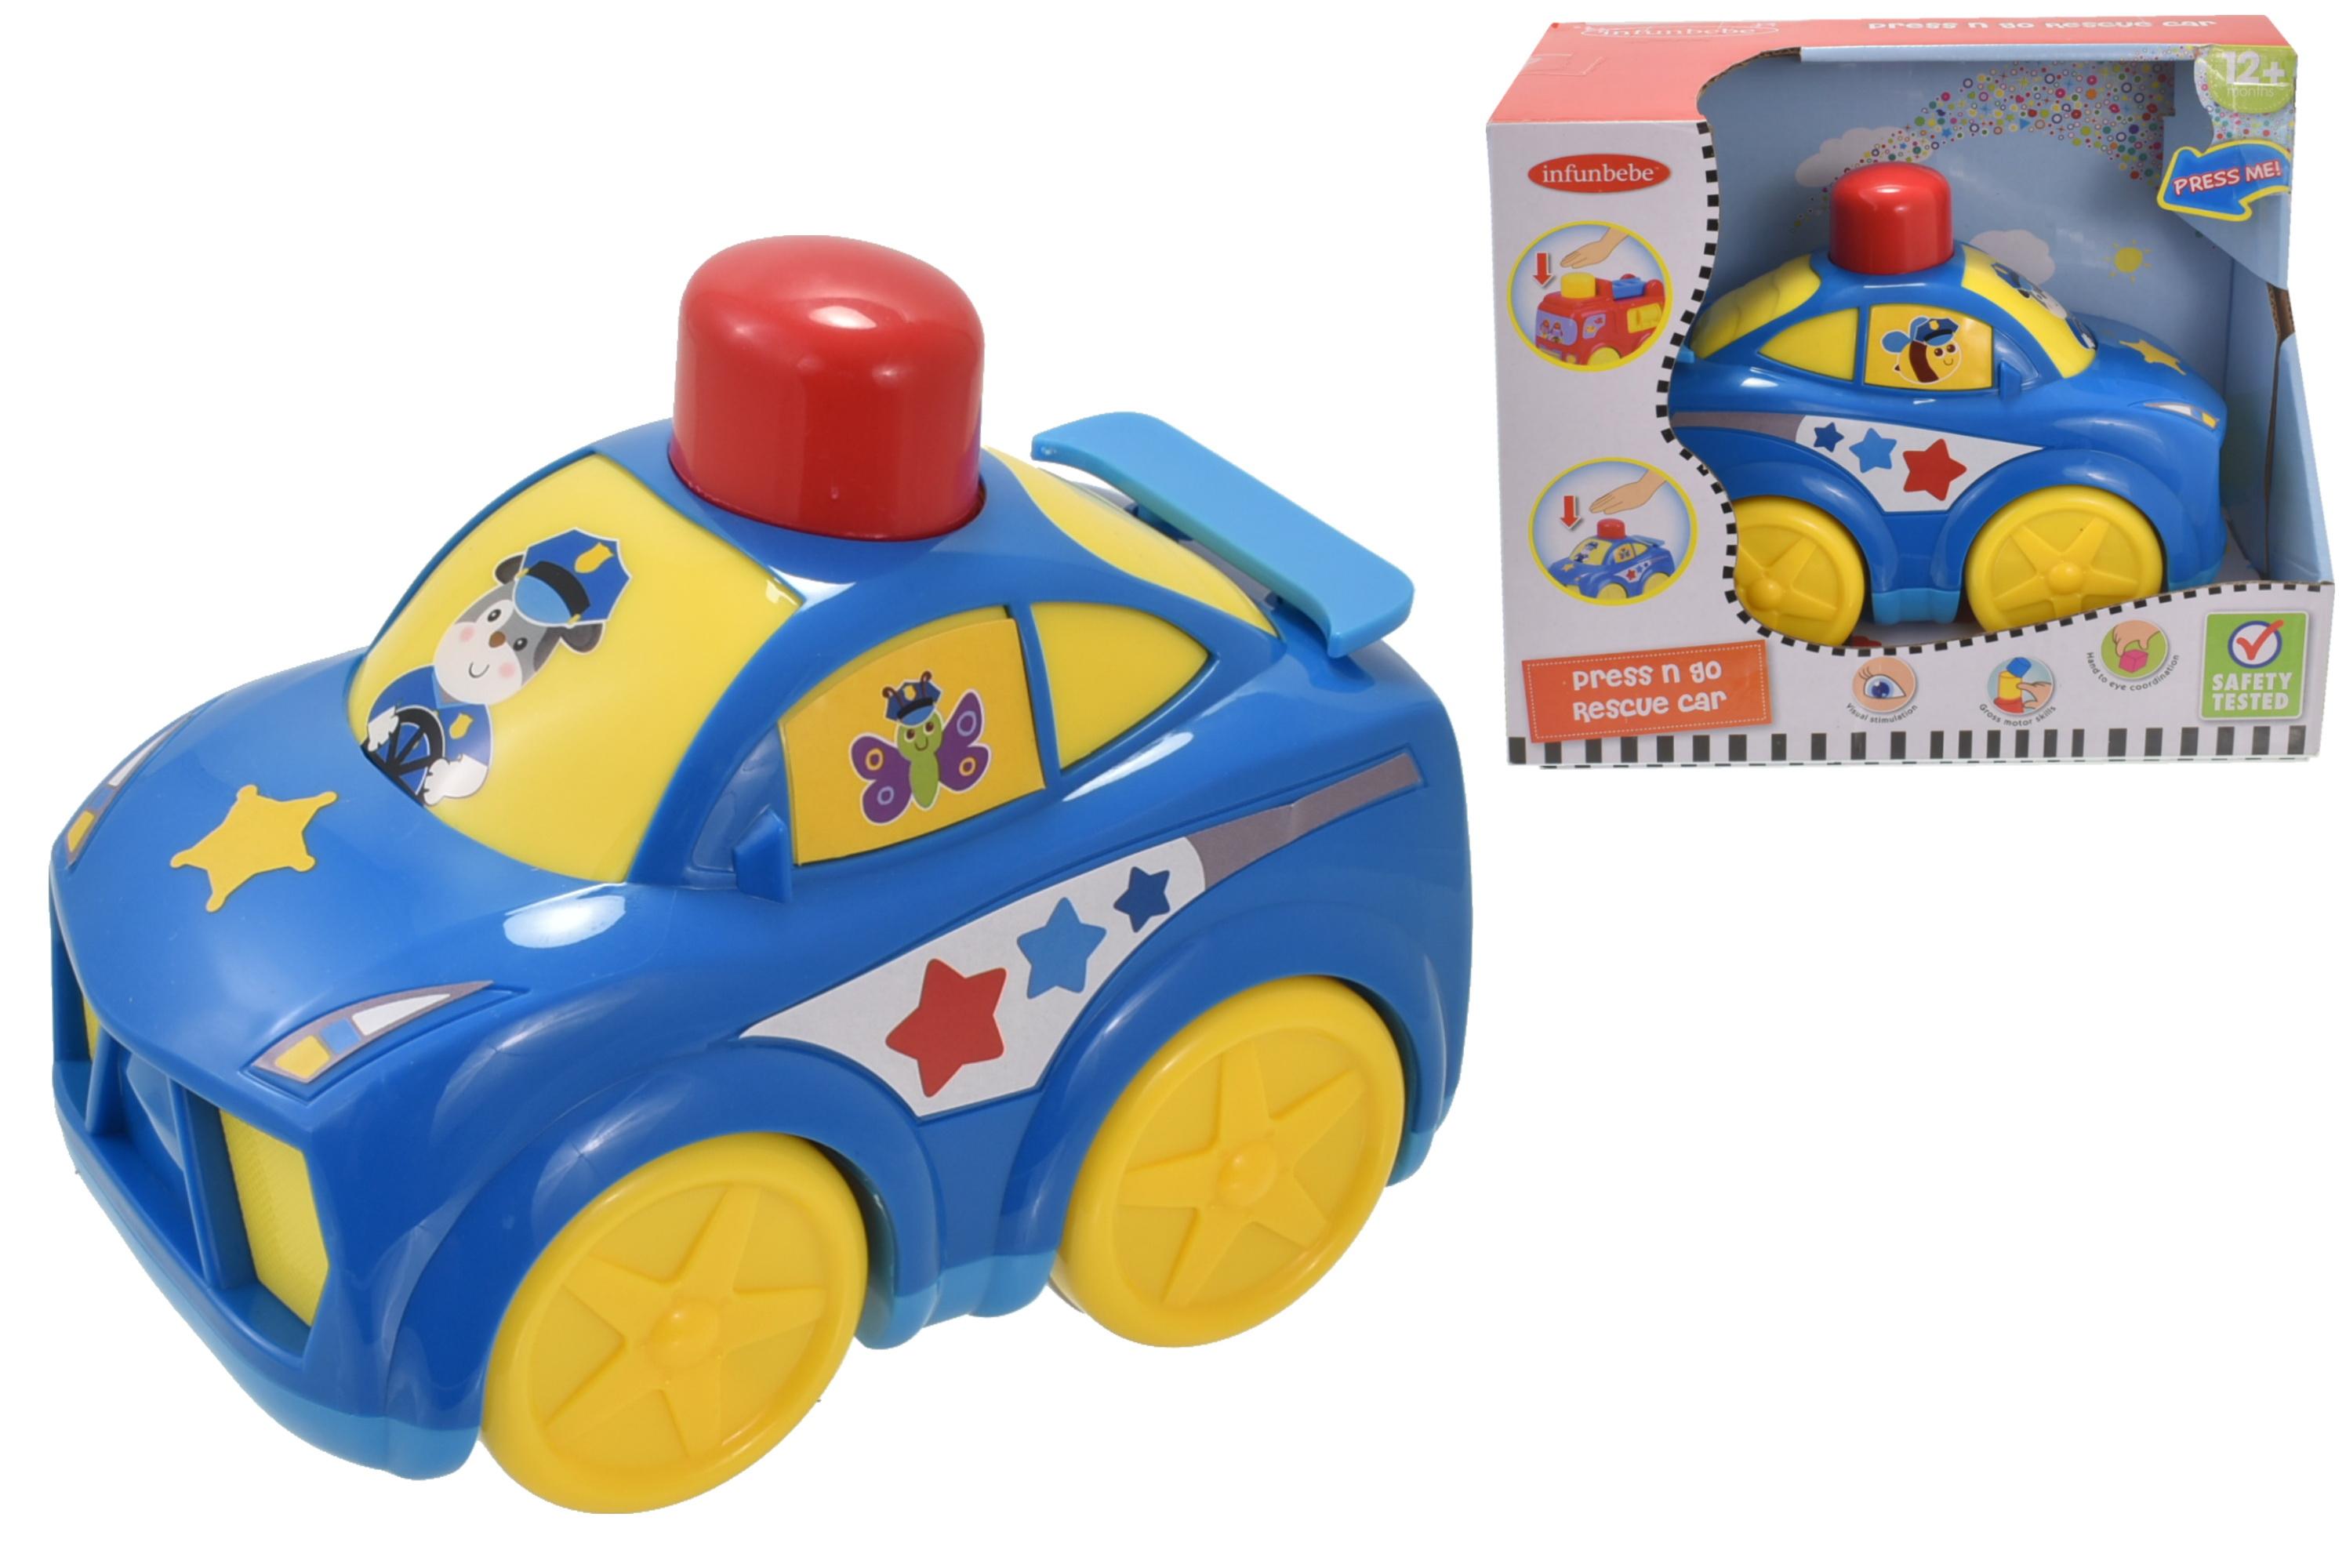 Press N Go Rescue Car In Open Touch Box - 12m+